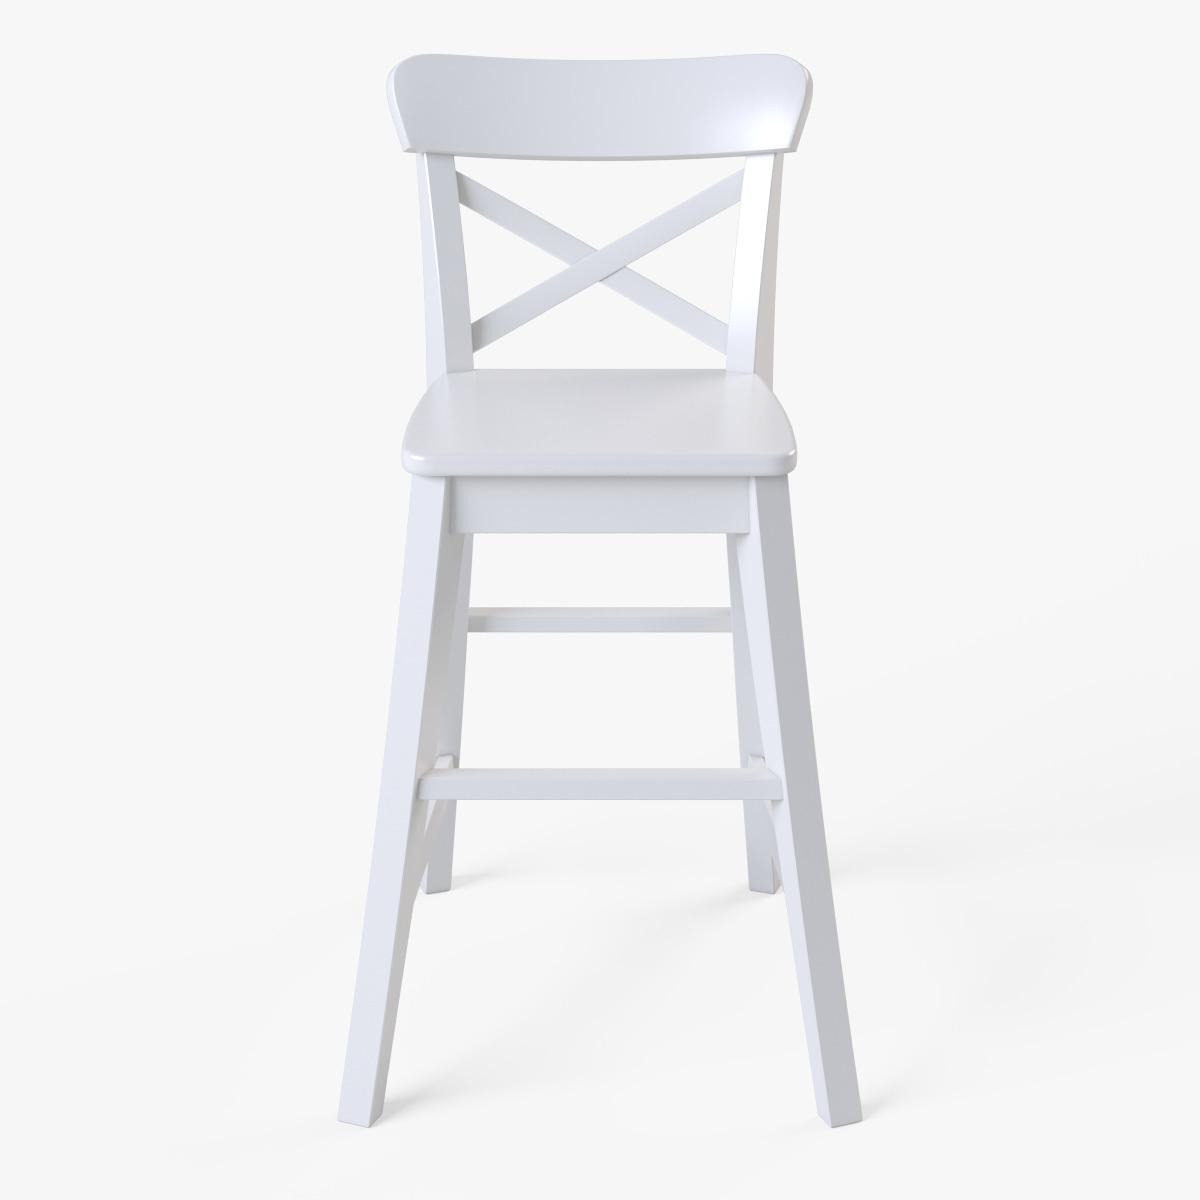 Ikea Ingolf Junior Chair White ikea ingolf children s  : 002Ingolfwhite from bphnq.adtddns.asia size 1200 x 1200 jpeg 59kB